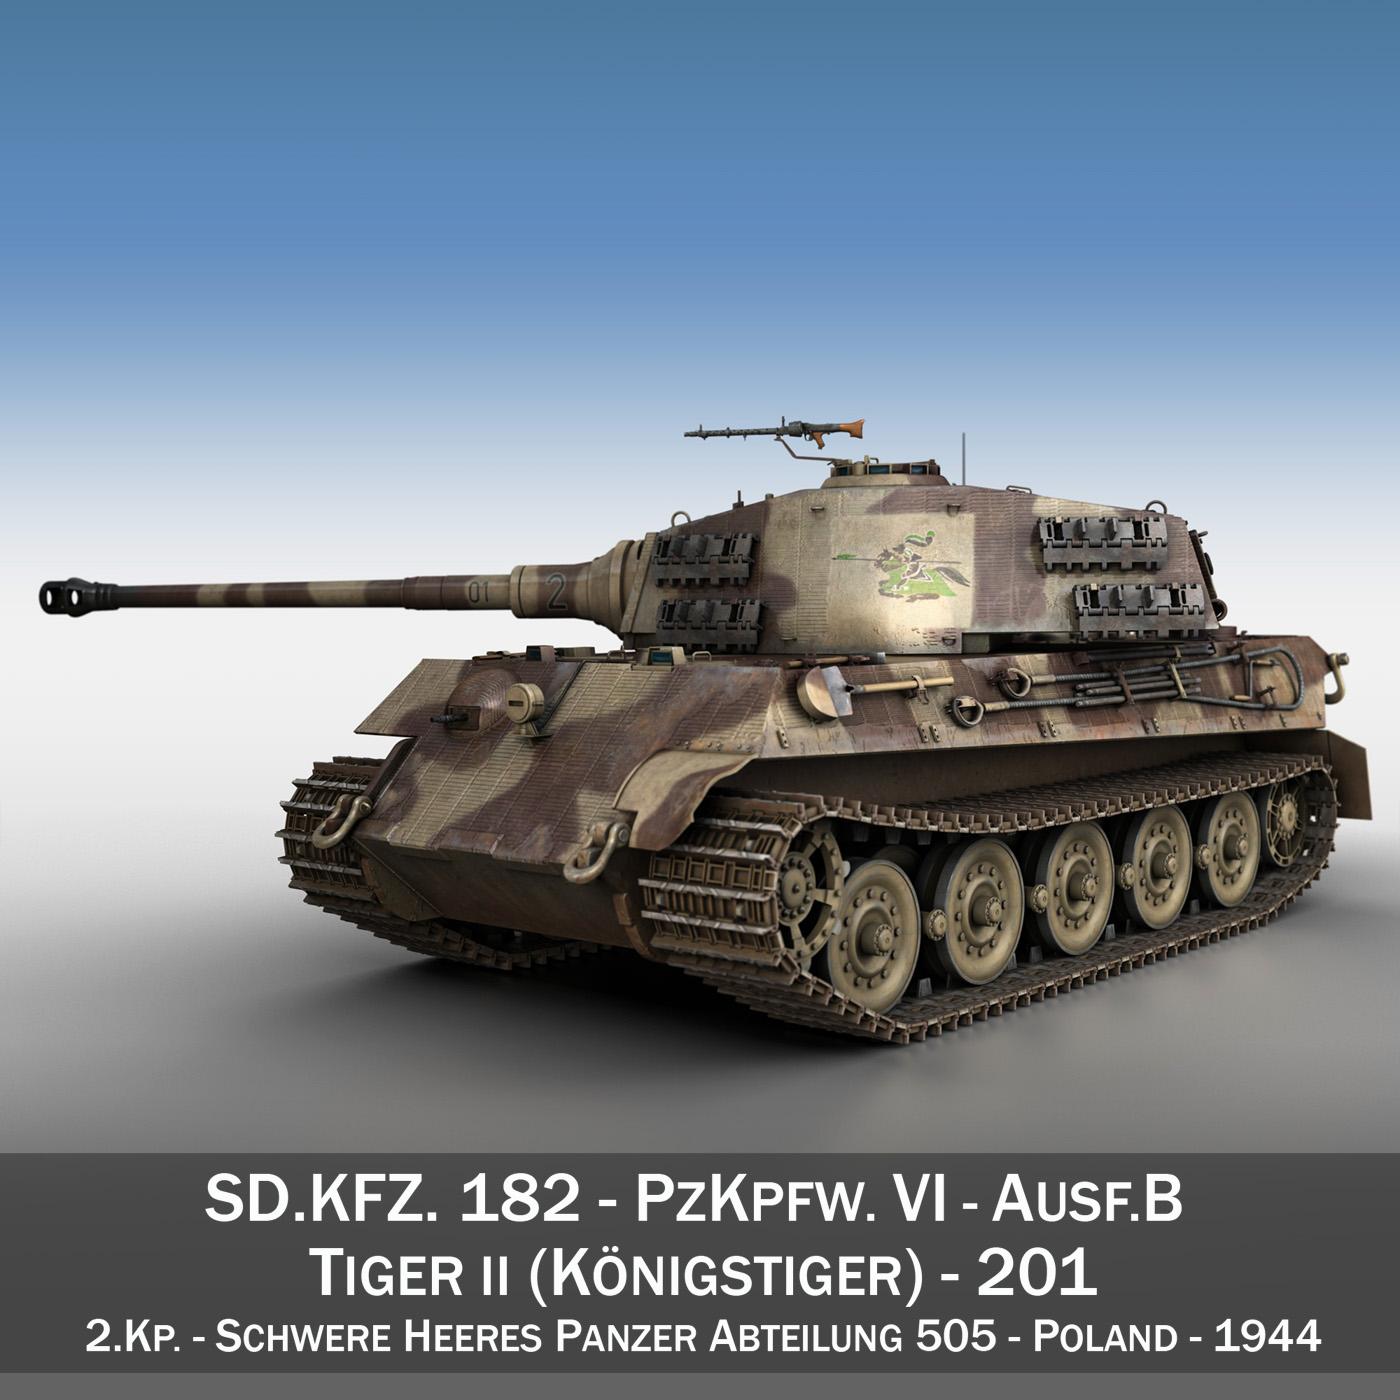 Panzerkampfwagen VI - Ausf B - Tiger II - 201 3d model  293301